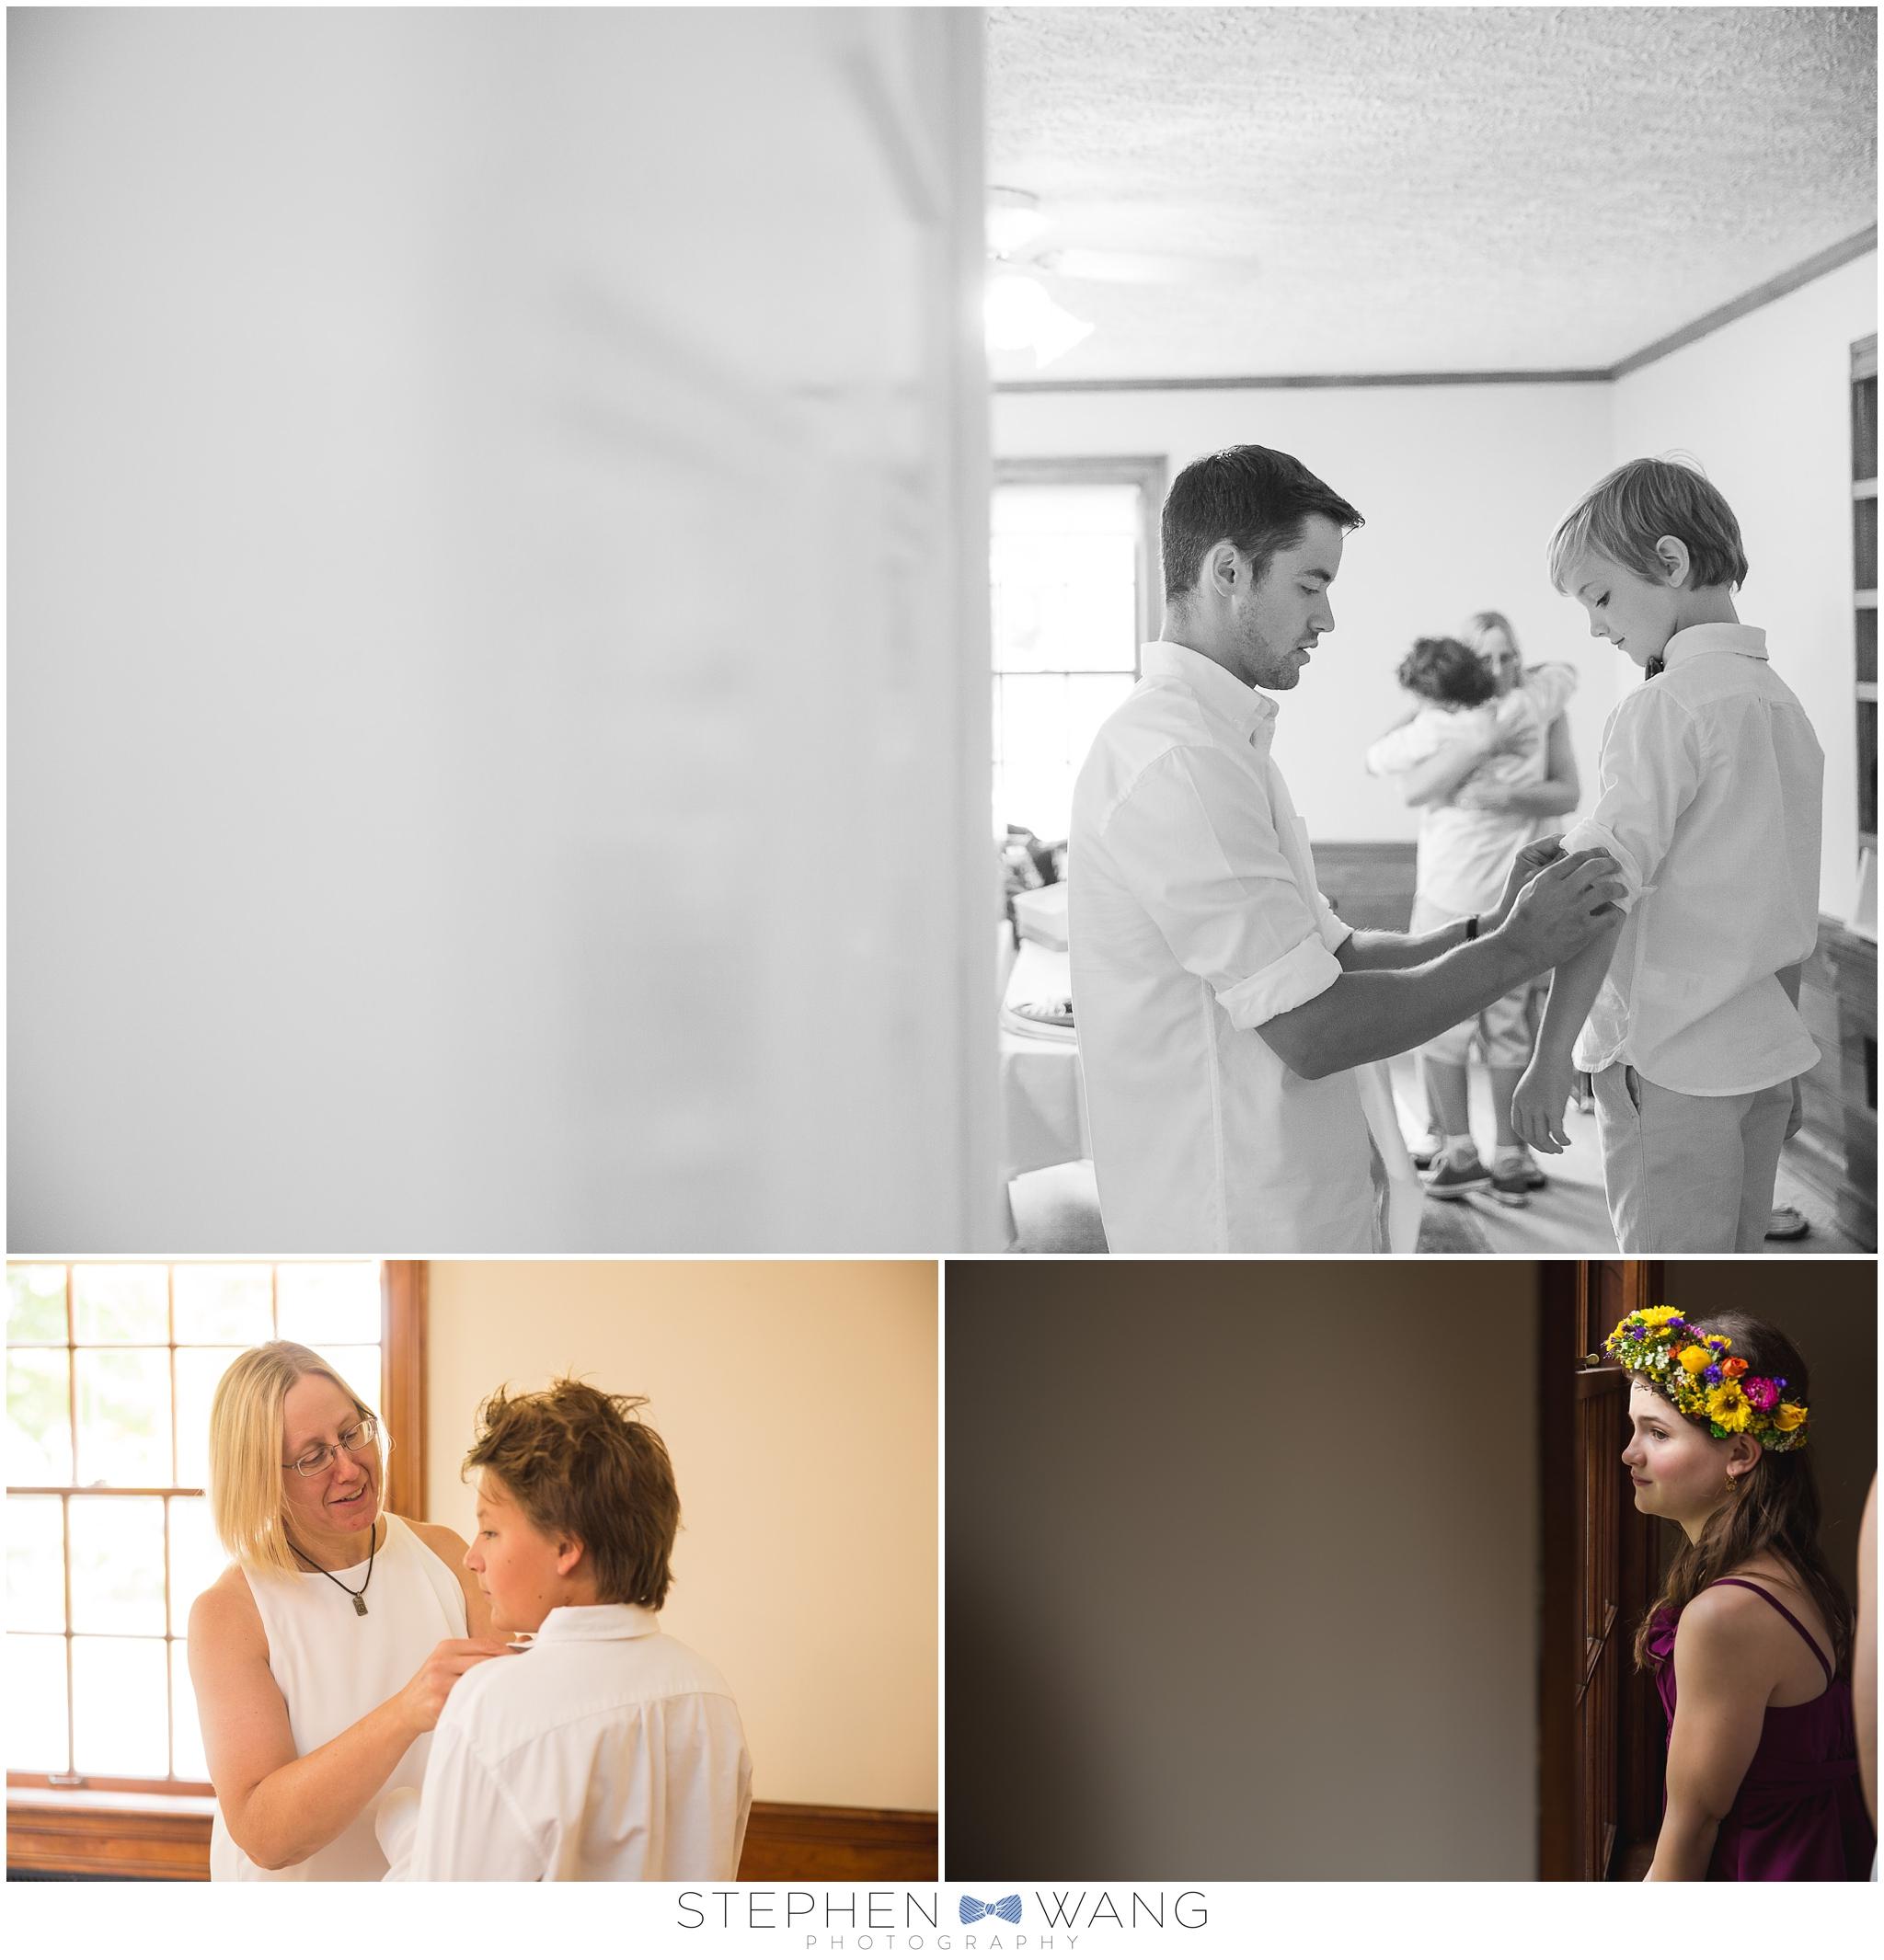 ct wedding photographer stephen wang photography crown point ecology center same sex wedding akron ohio hippie wedding tie die volkwagen bus vw peace connecticut wedding photographer-09-24_0004.jpg